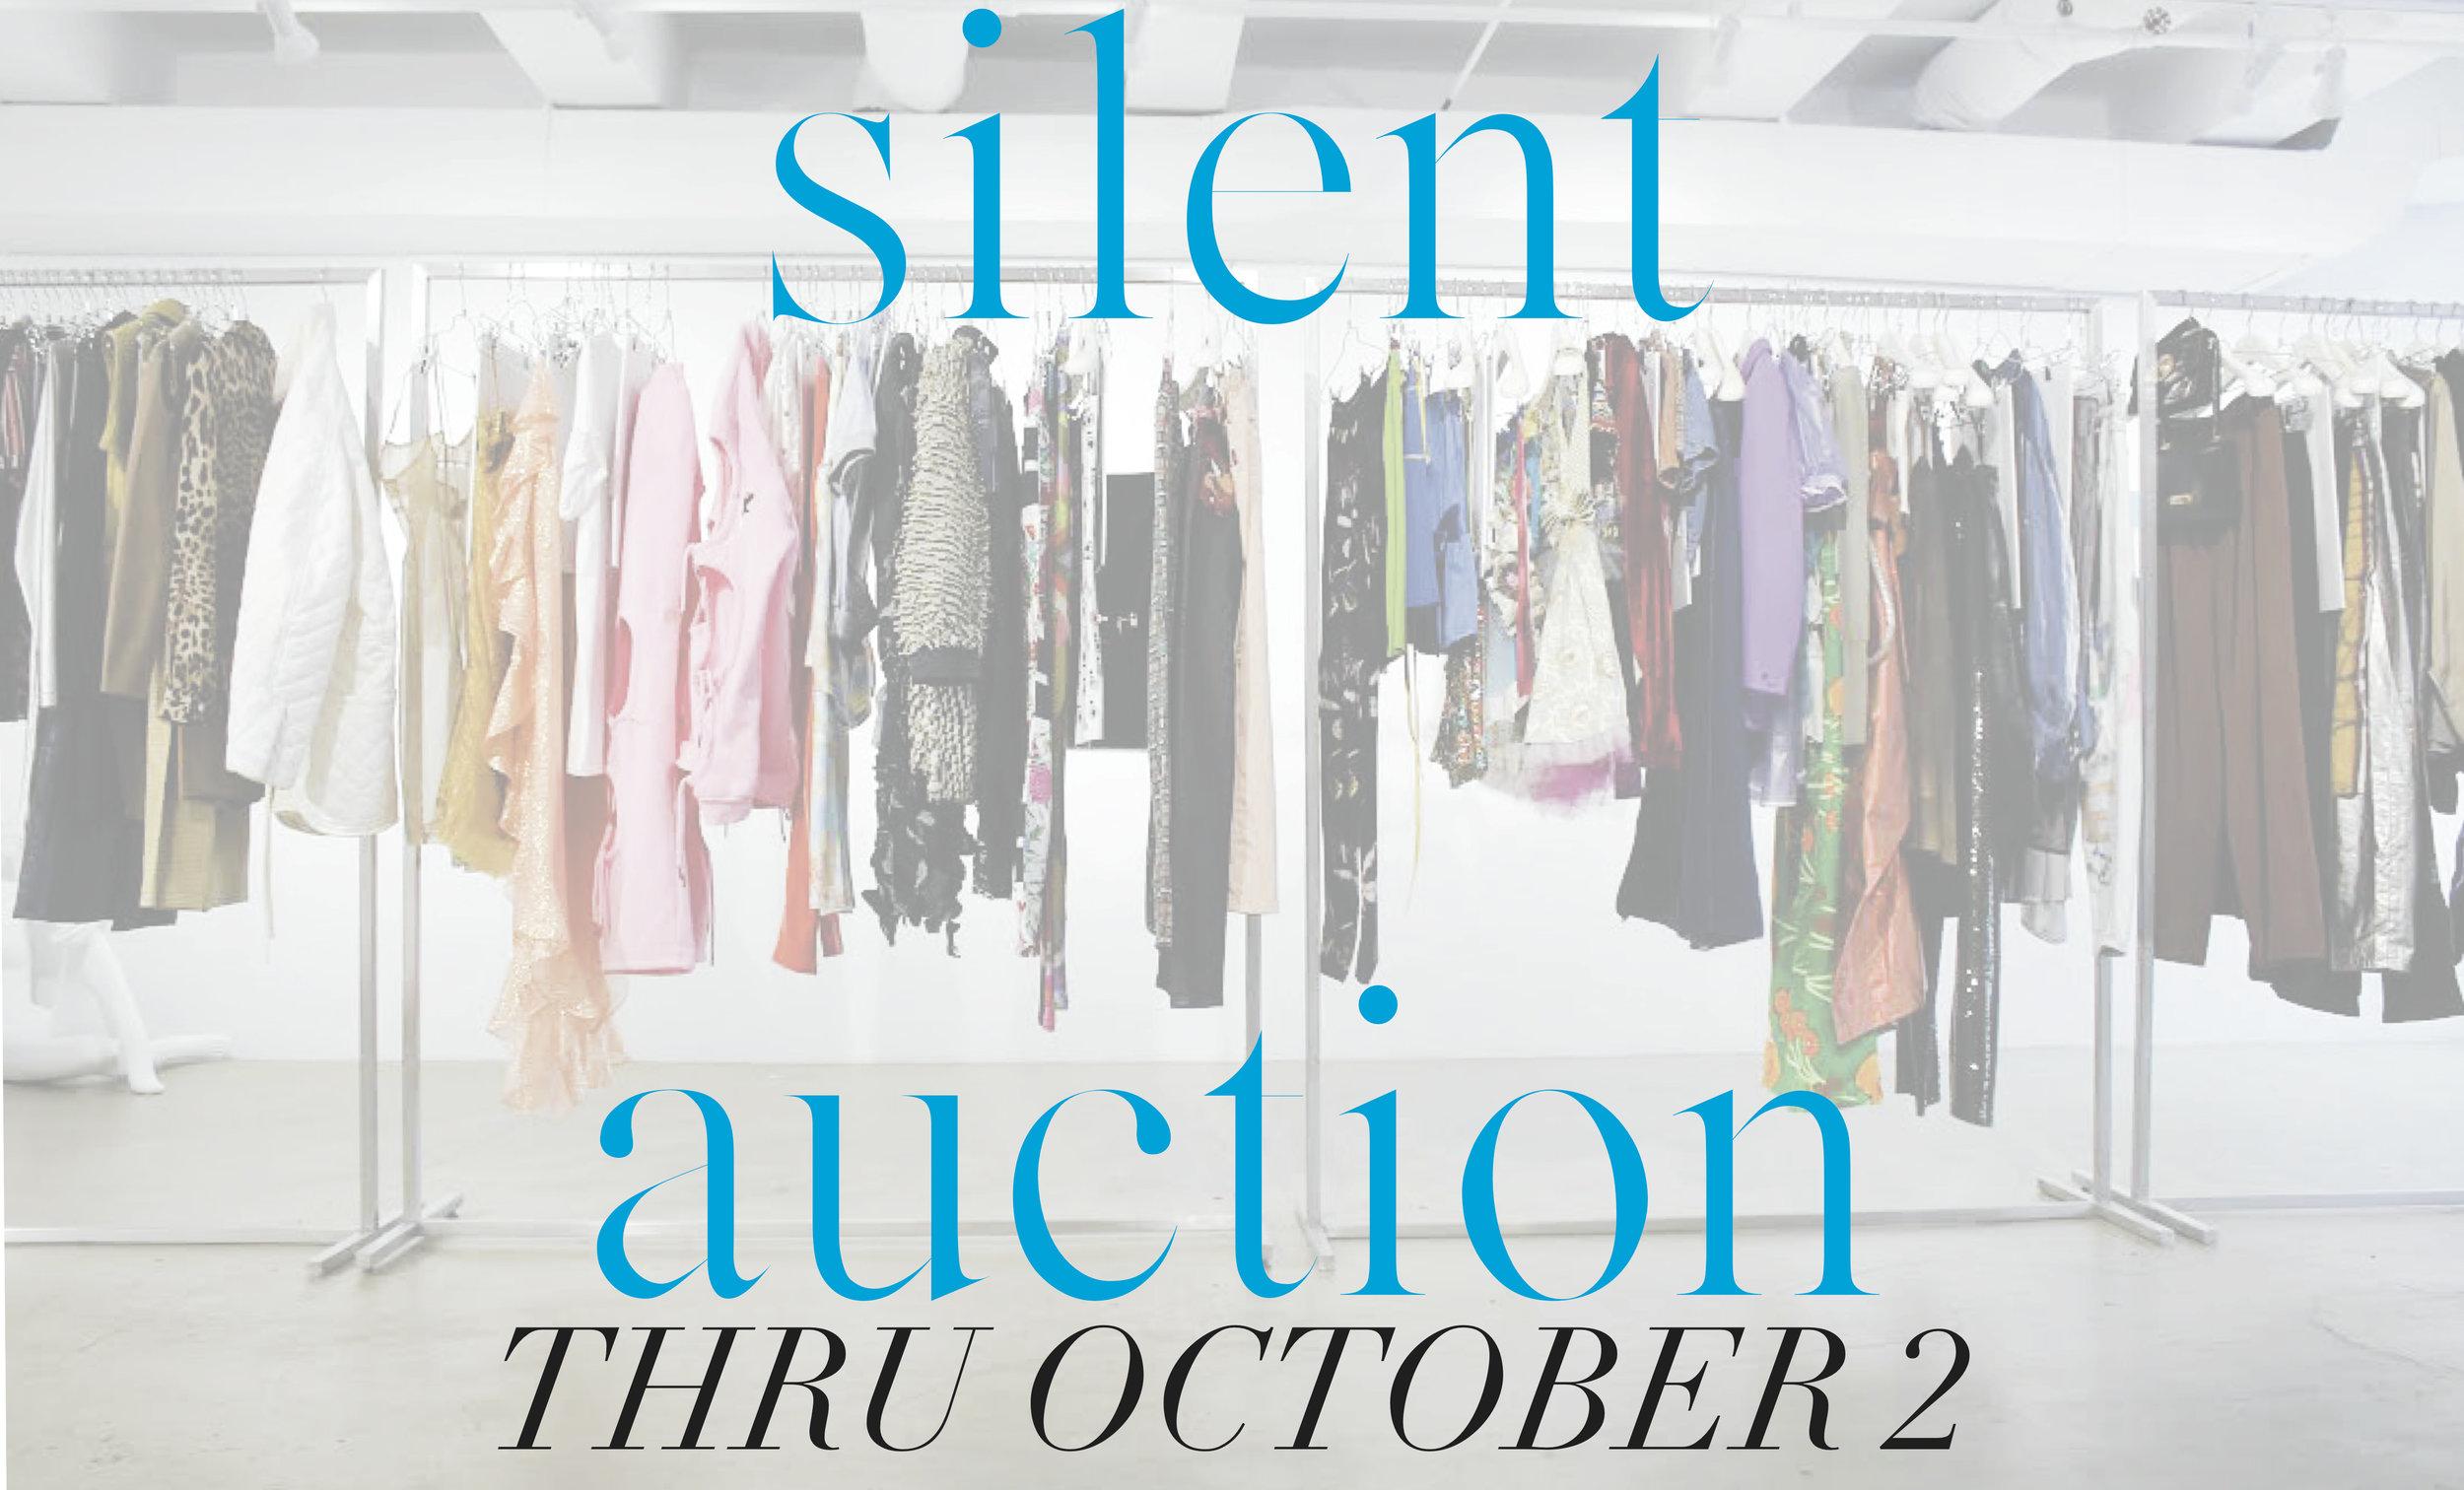 silent auction banner.jpg